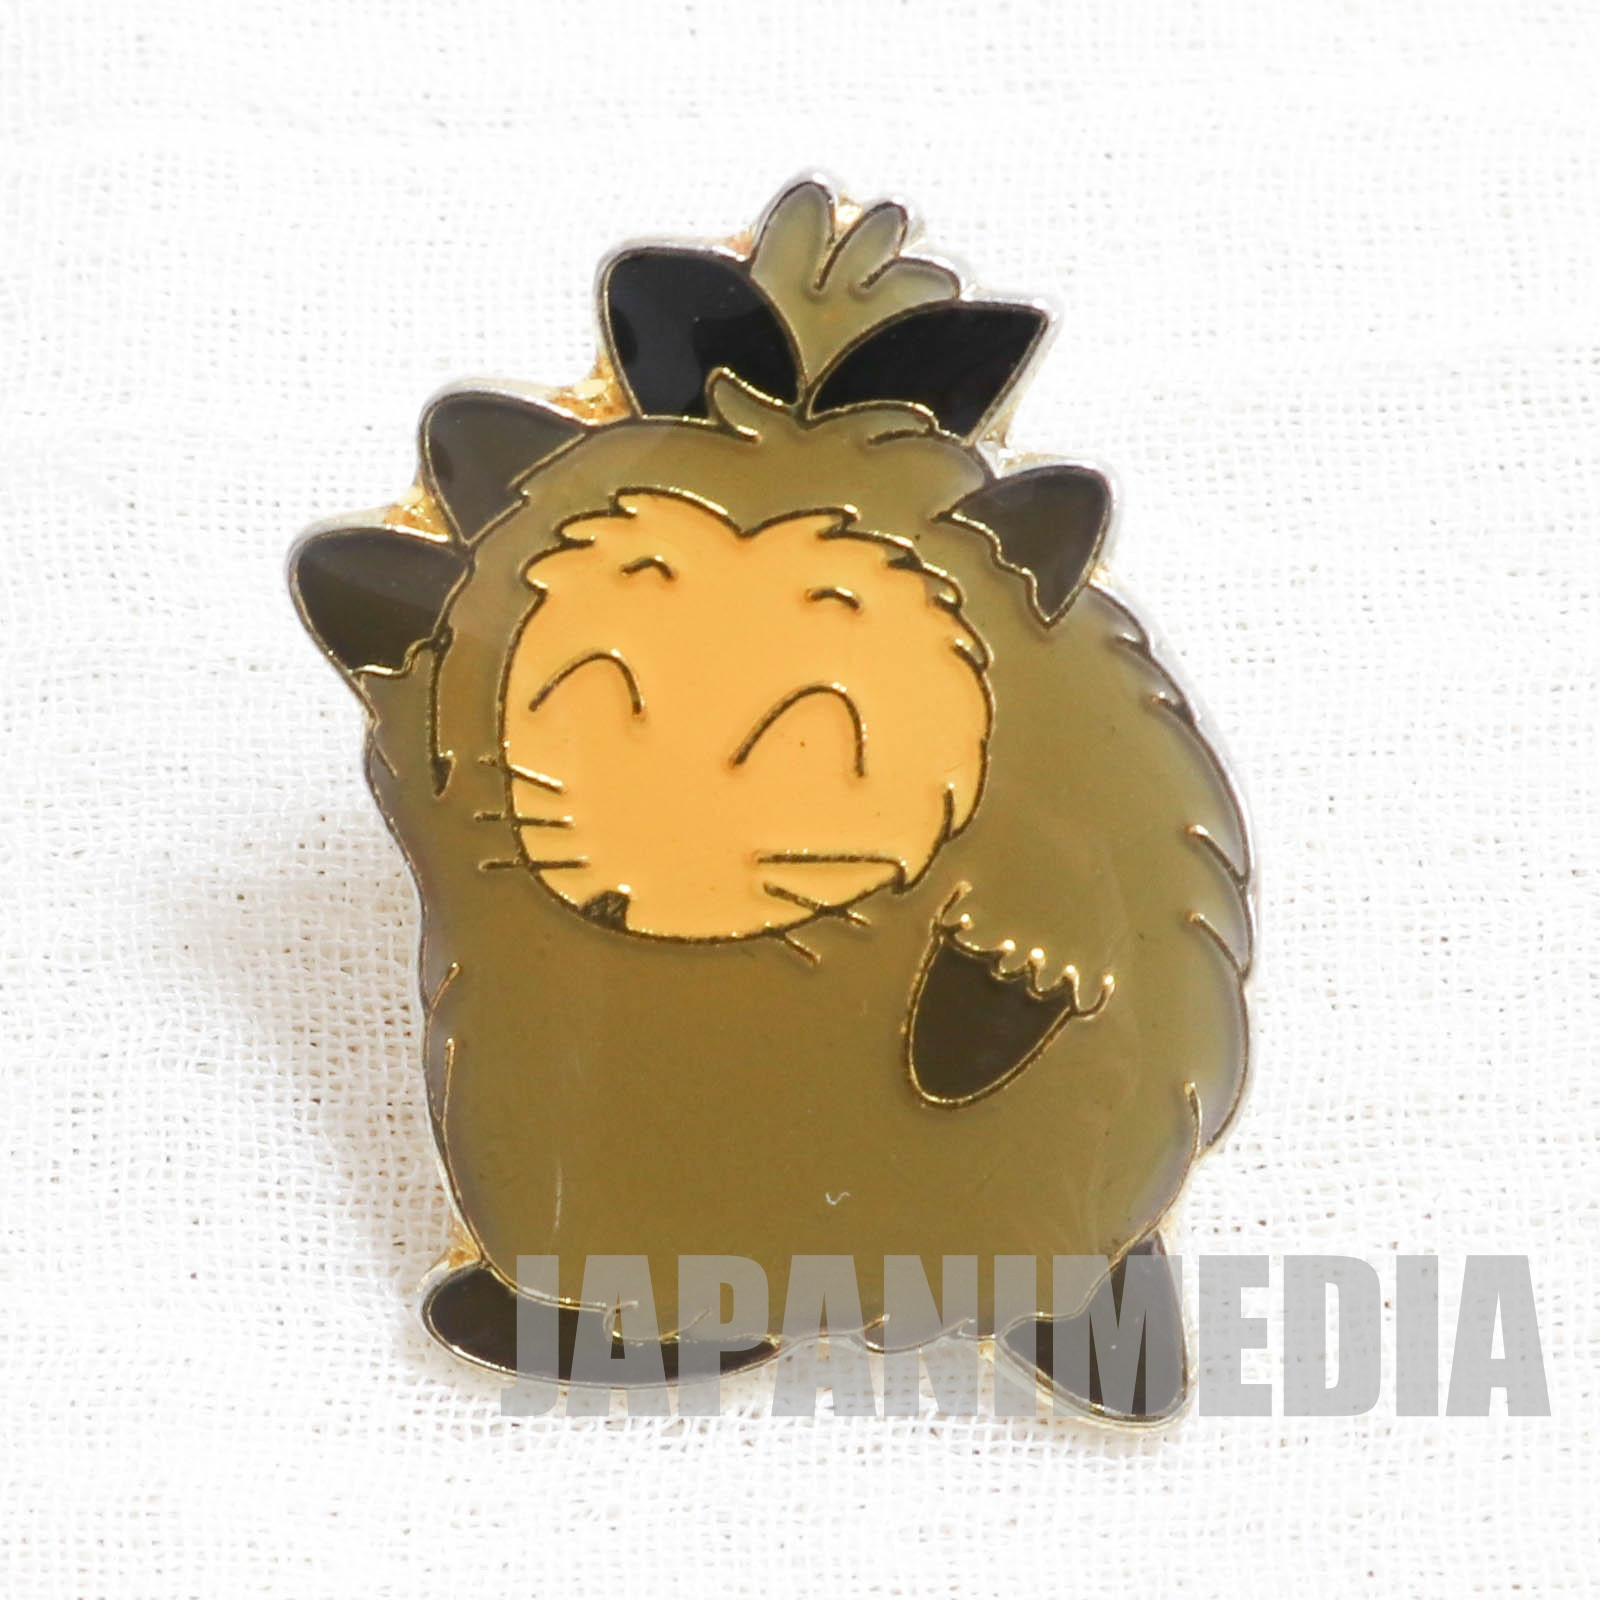 Saint Tail Ruby Saint Tail Collection Pins JAPAN ANIME